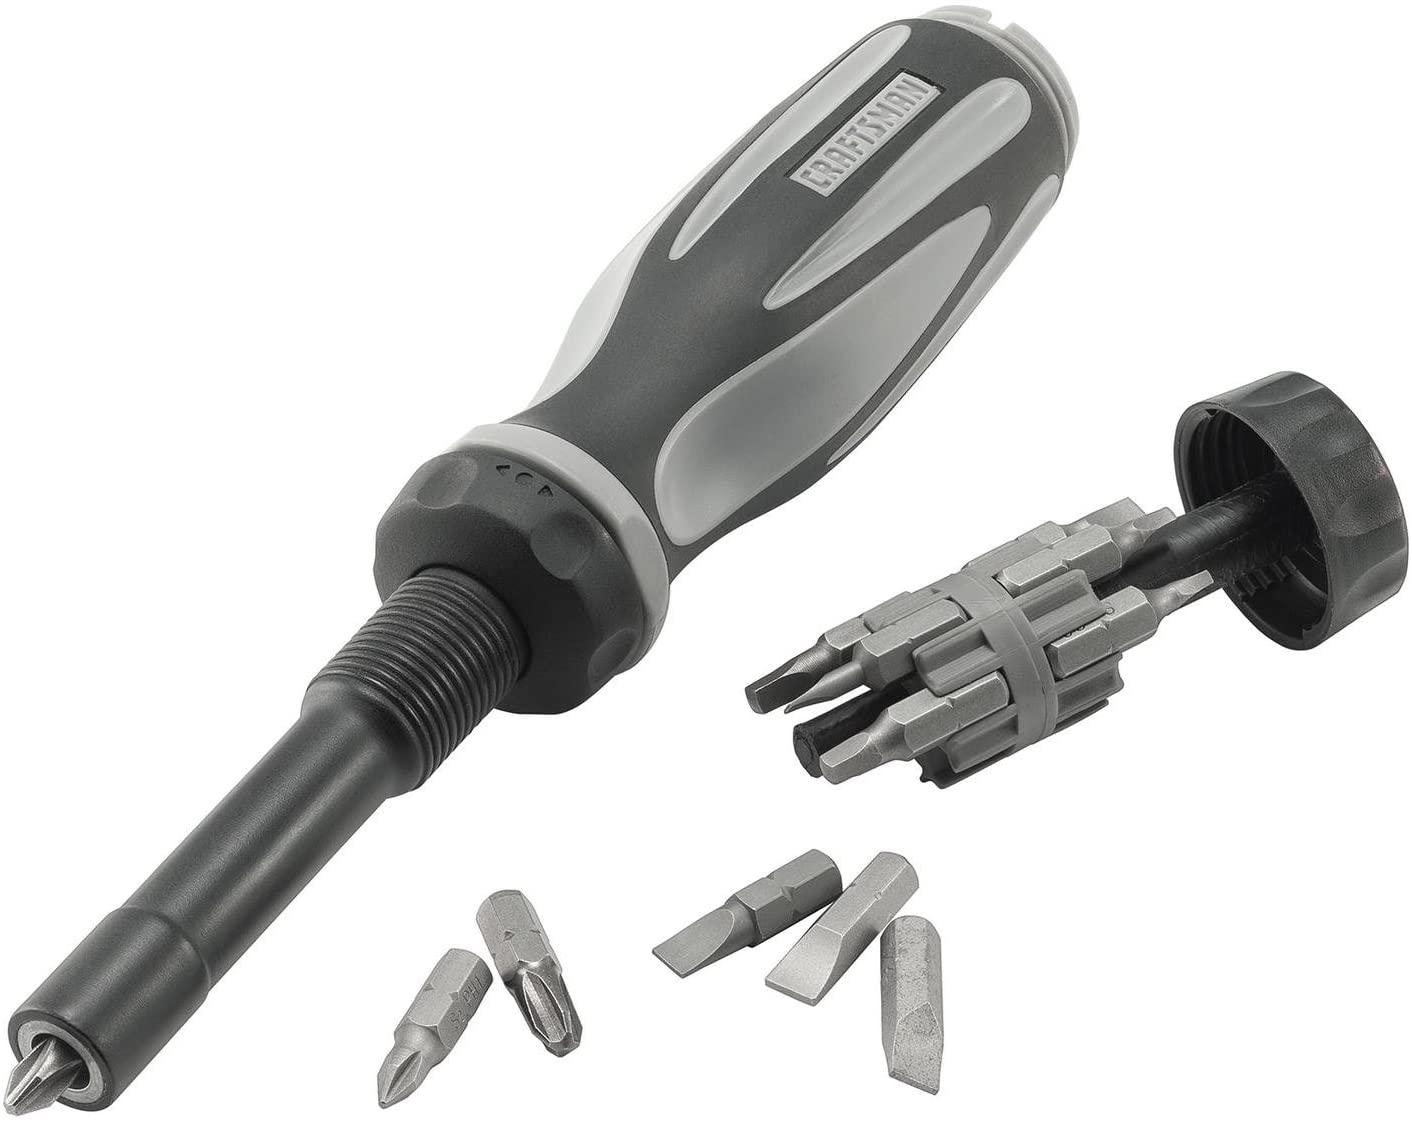 Craftsman 13-piece Extreme Grip Bit Driver Set (9-47227)